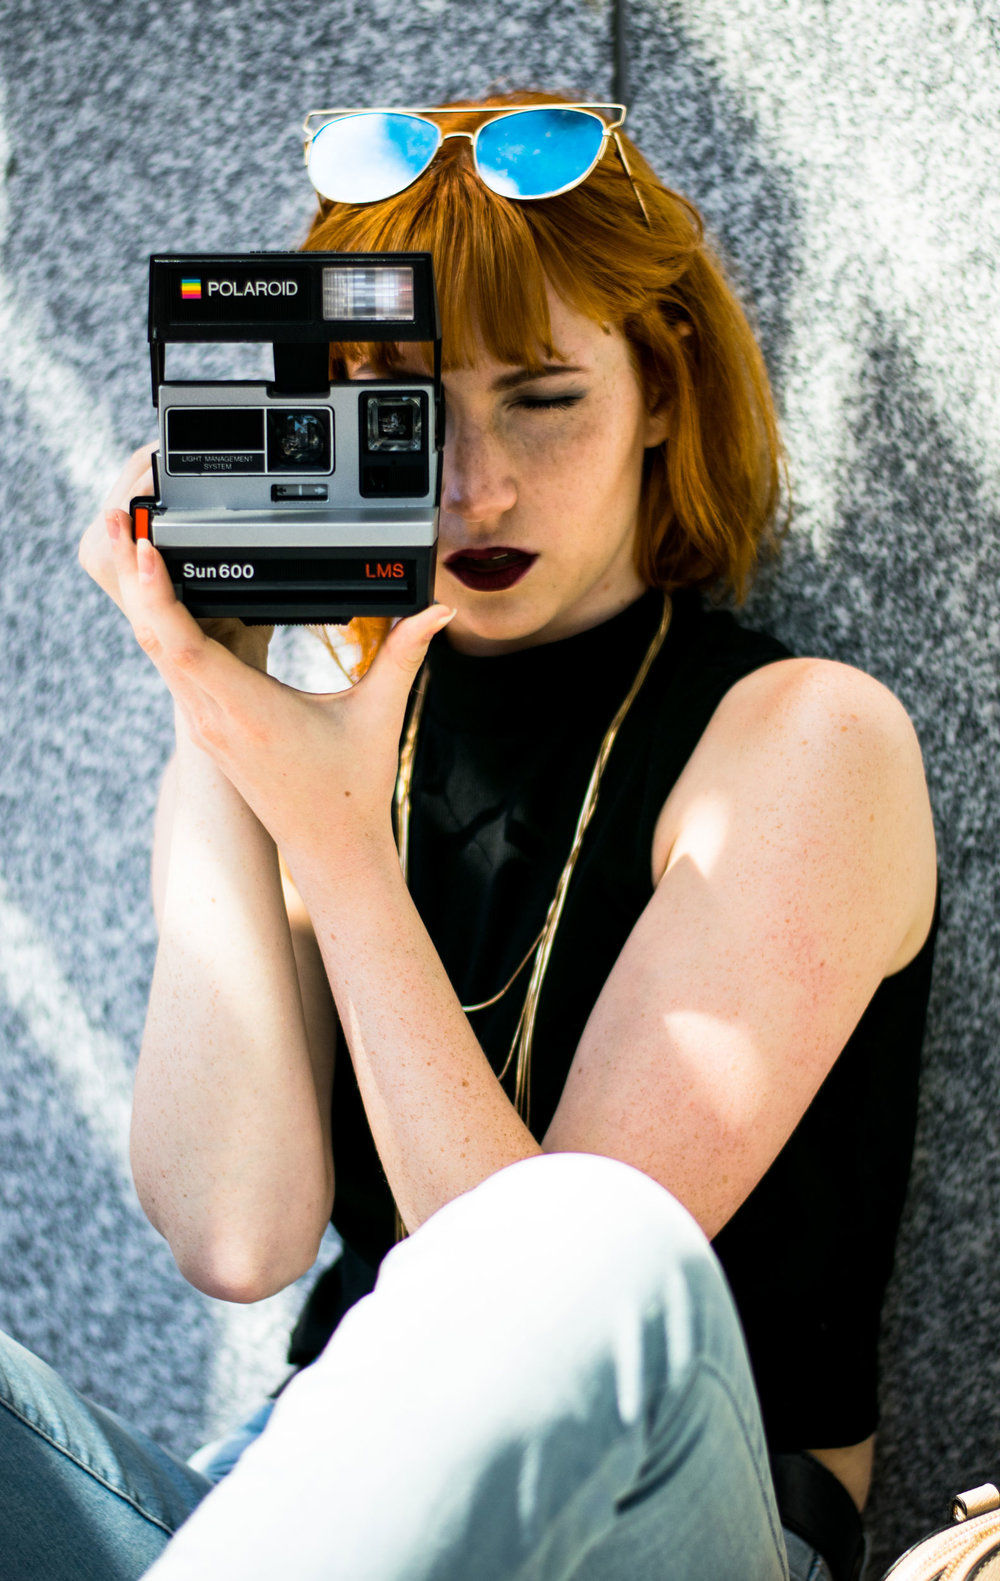 Polaroid3.jpg